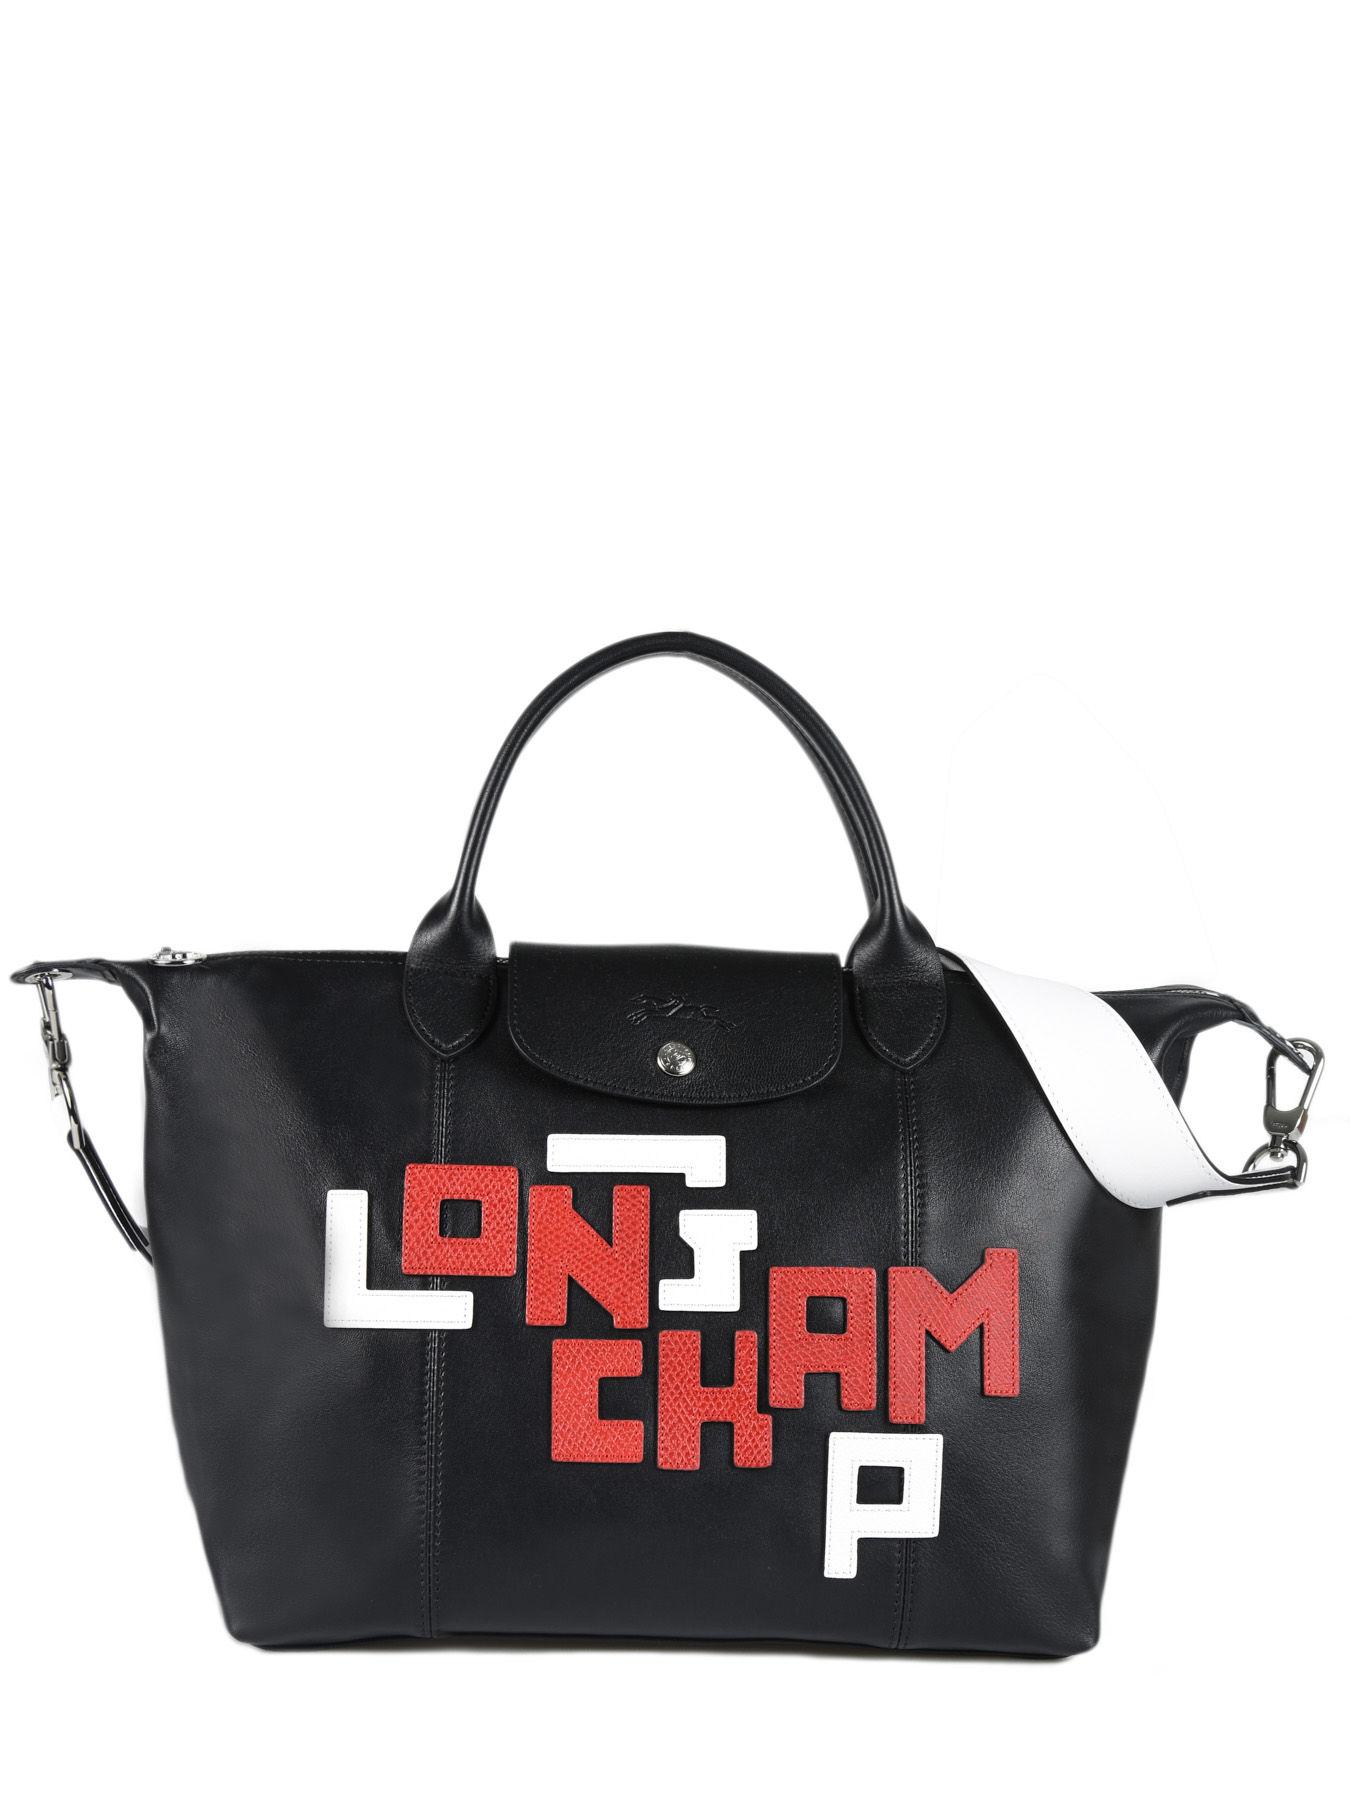 db5cdbf8c12 Handtas Longchamp Le pliage cuir lgp 1515755 op edisac.be